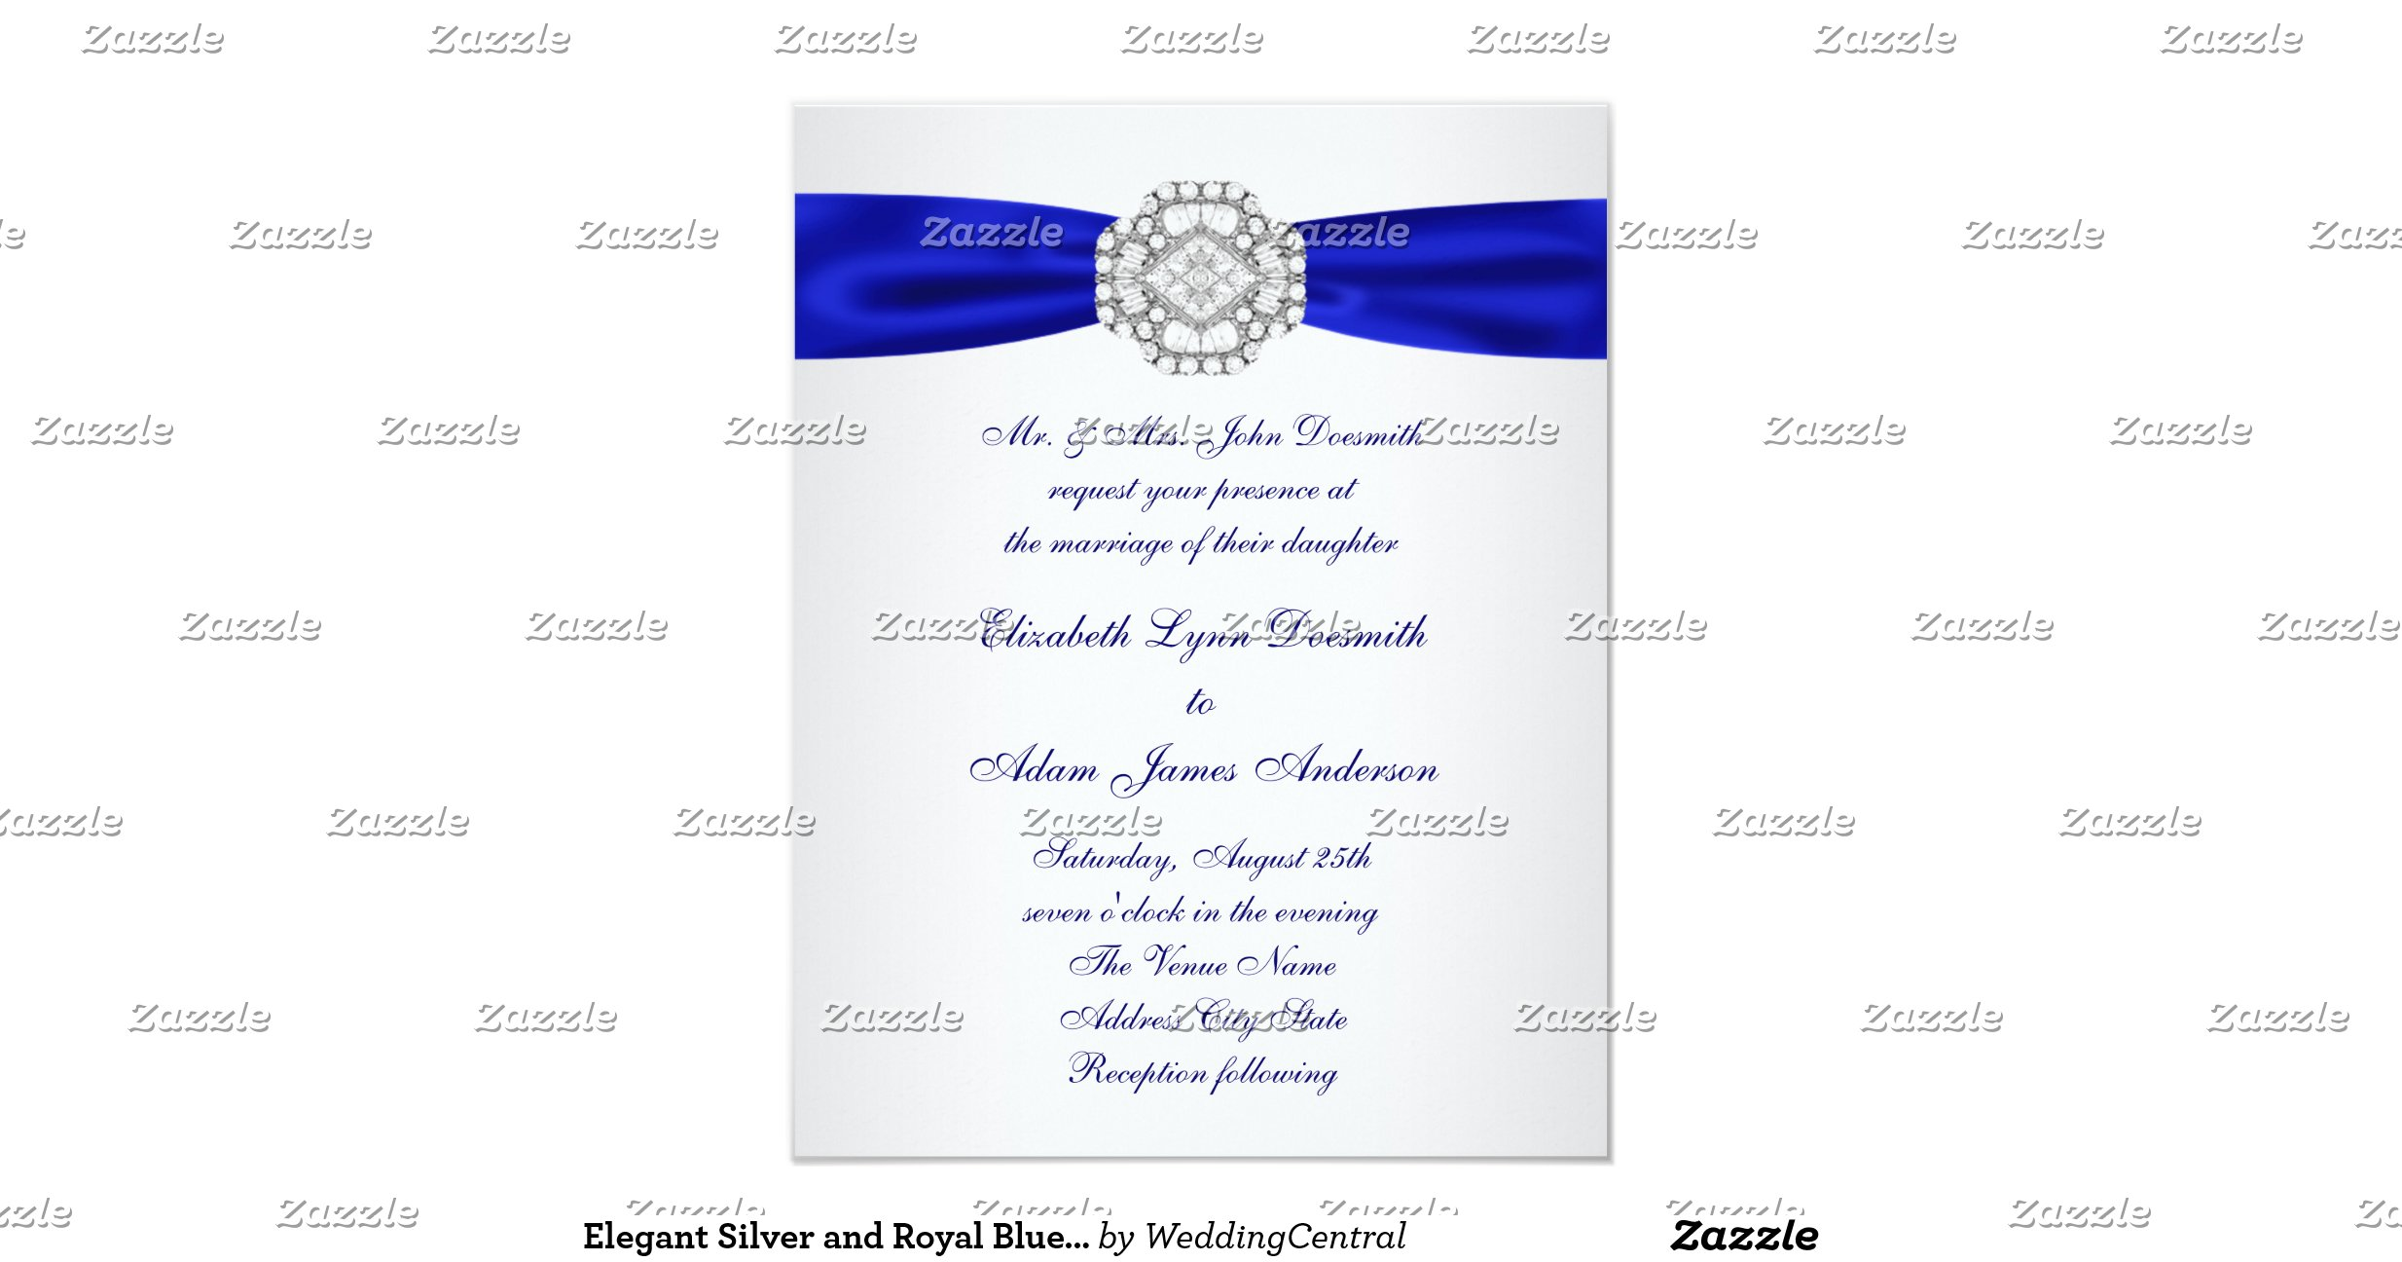 Royal Blue Wedding Invitations. Silver And Burgundy Wedding Colors - MTM